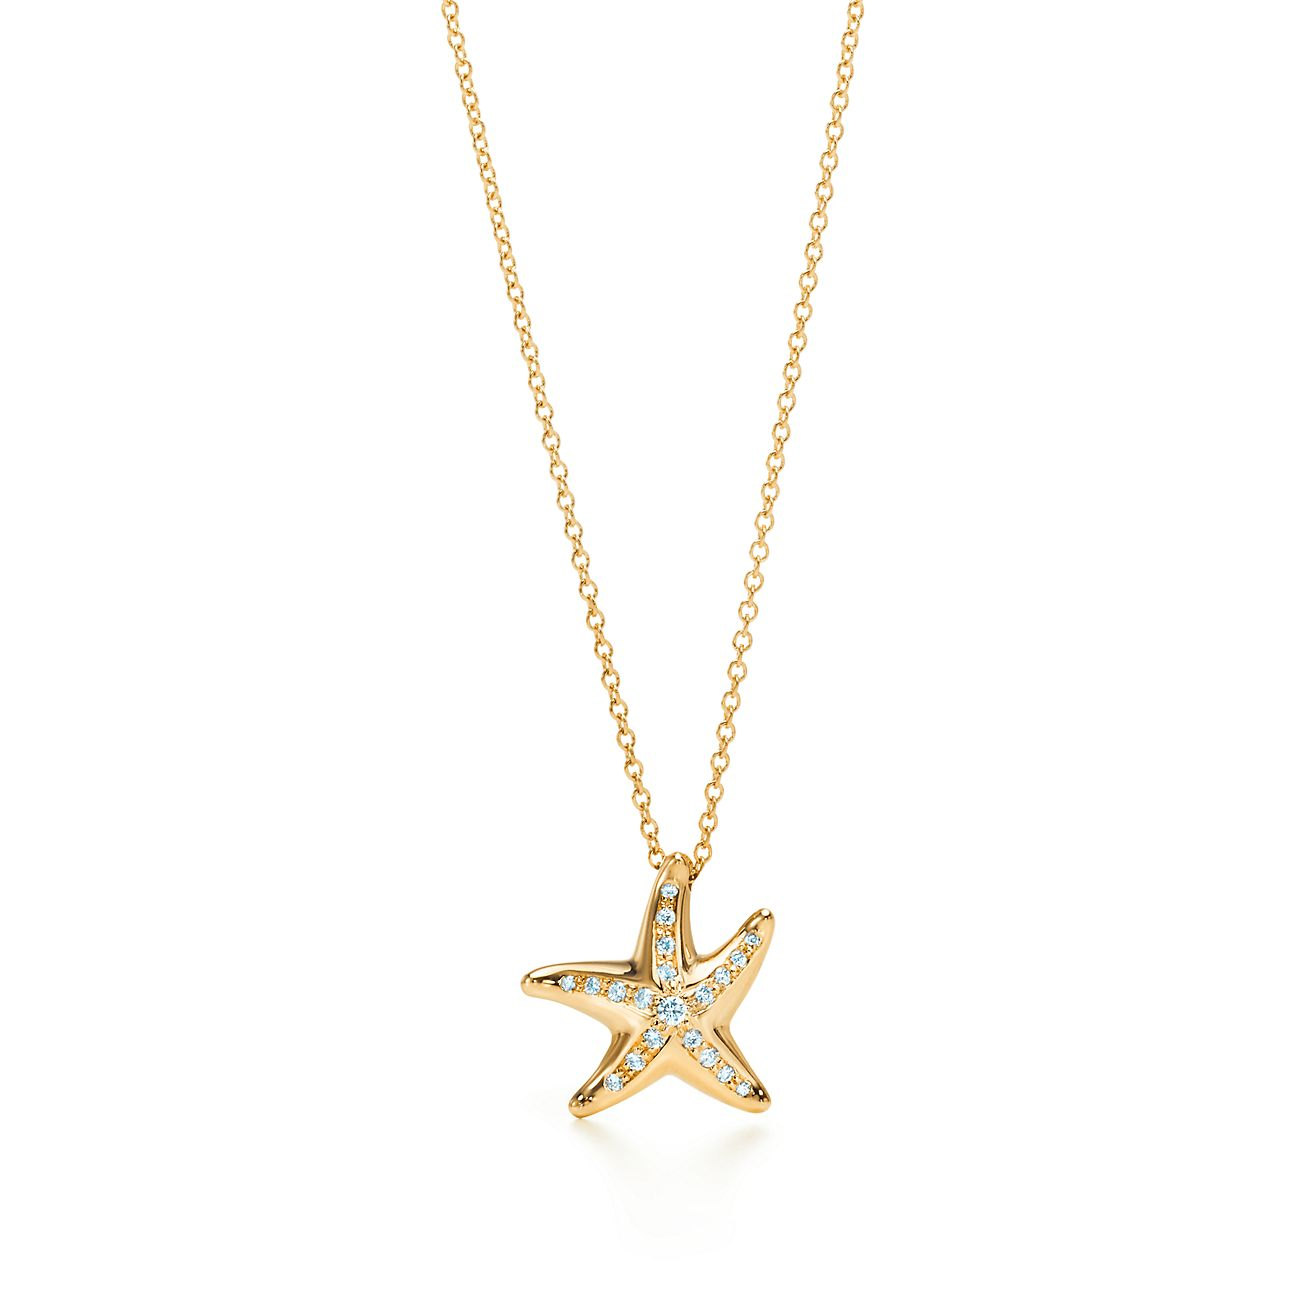 Elsa peretti starfish pendant with diamonds in 18k gold mini mini elsa perettistarfish pendant aloadofball Choice Image